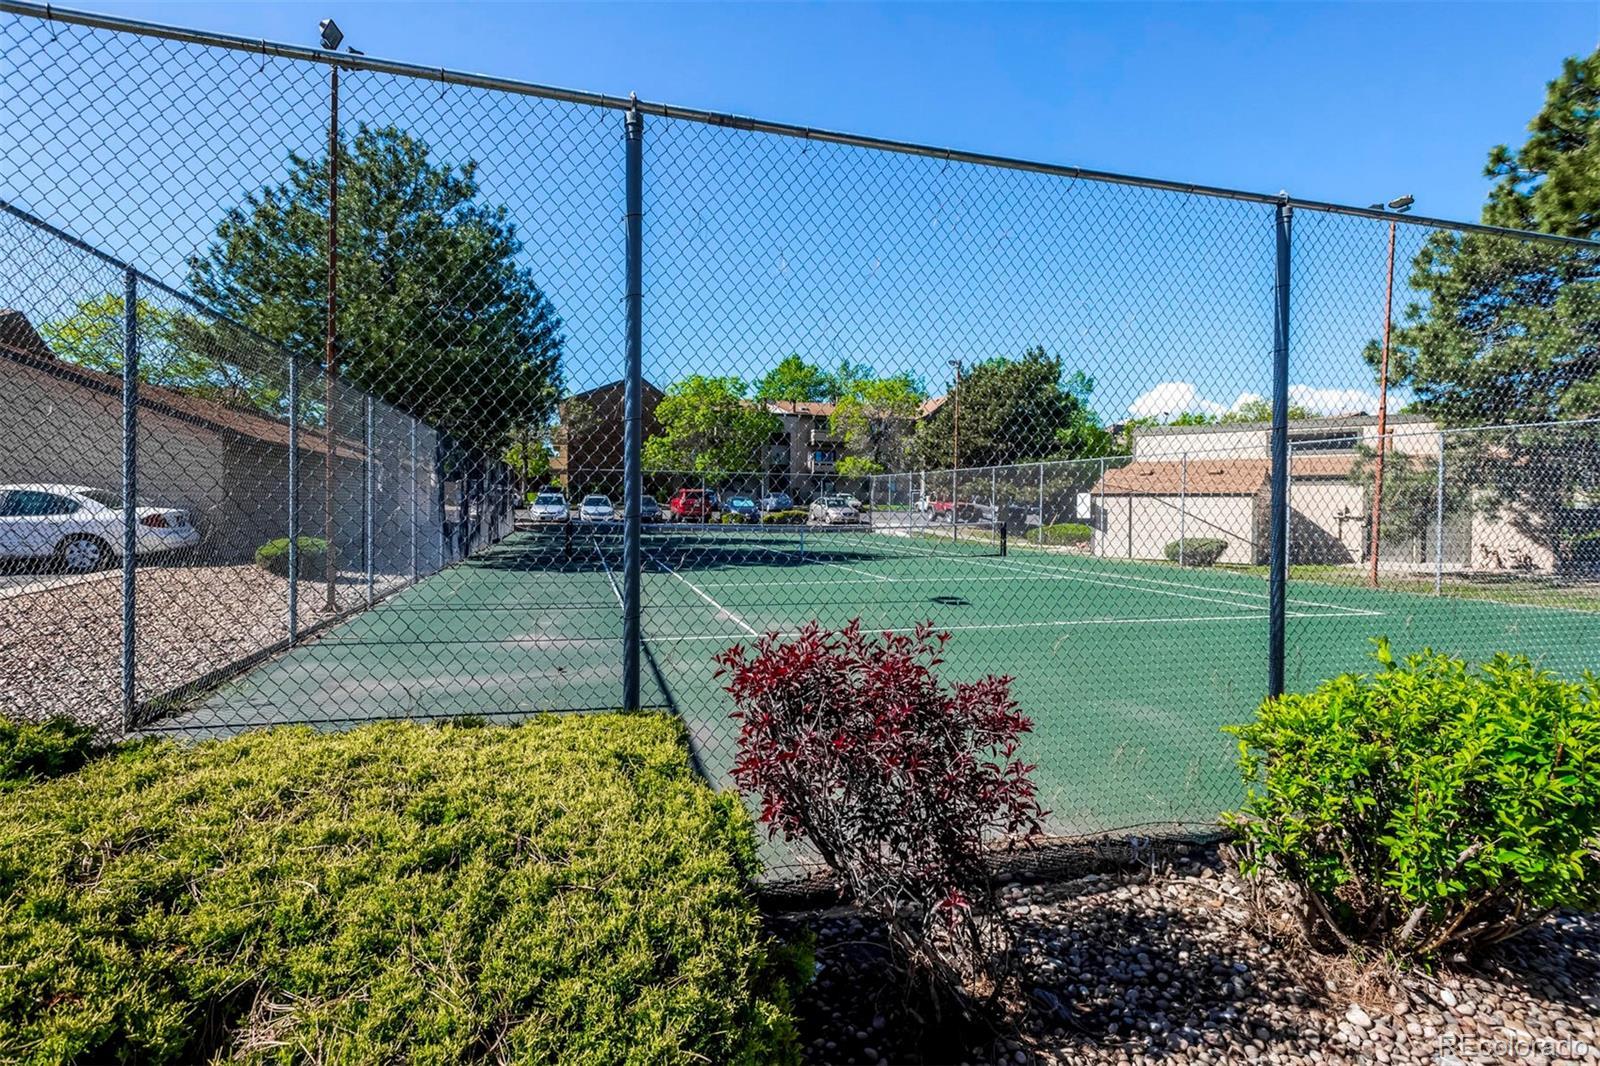 MLS# 6340316 - 20 - 420 Zang Street #3-102, Lakewood, CO 80228